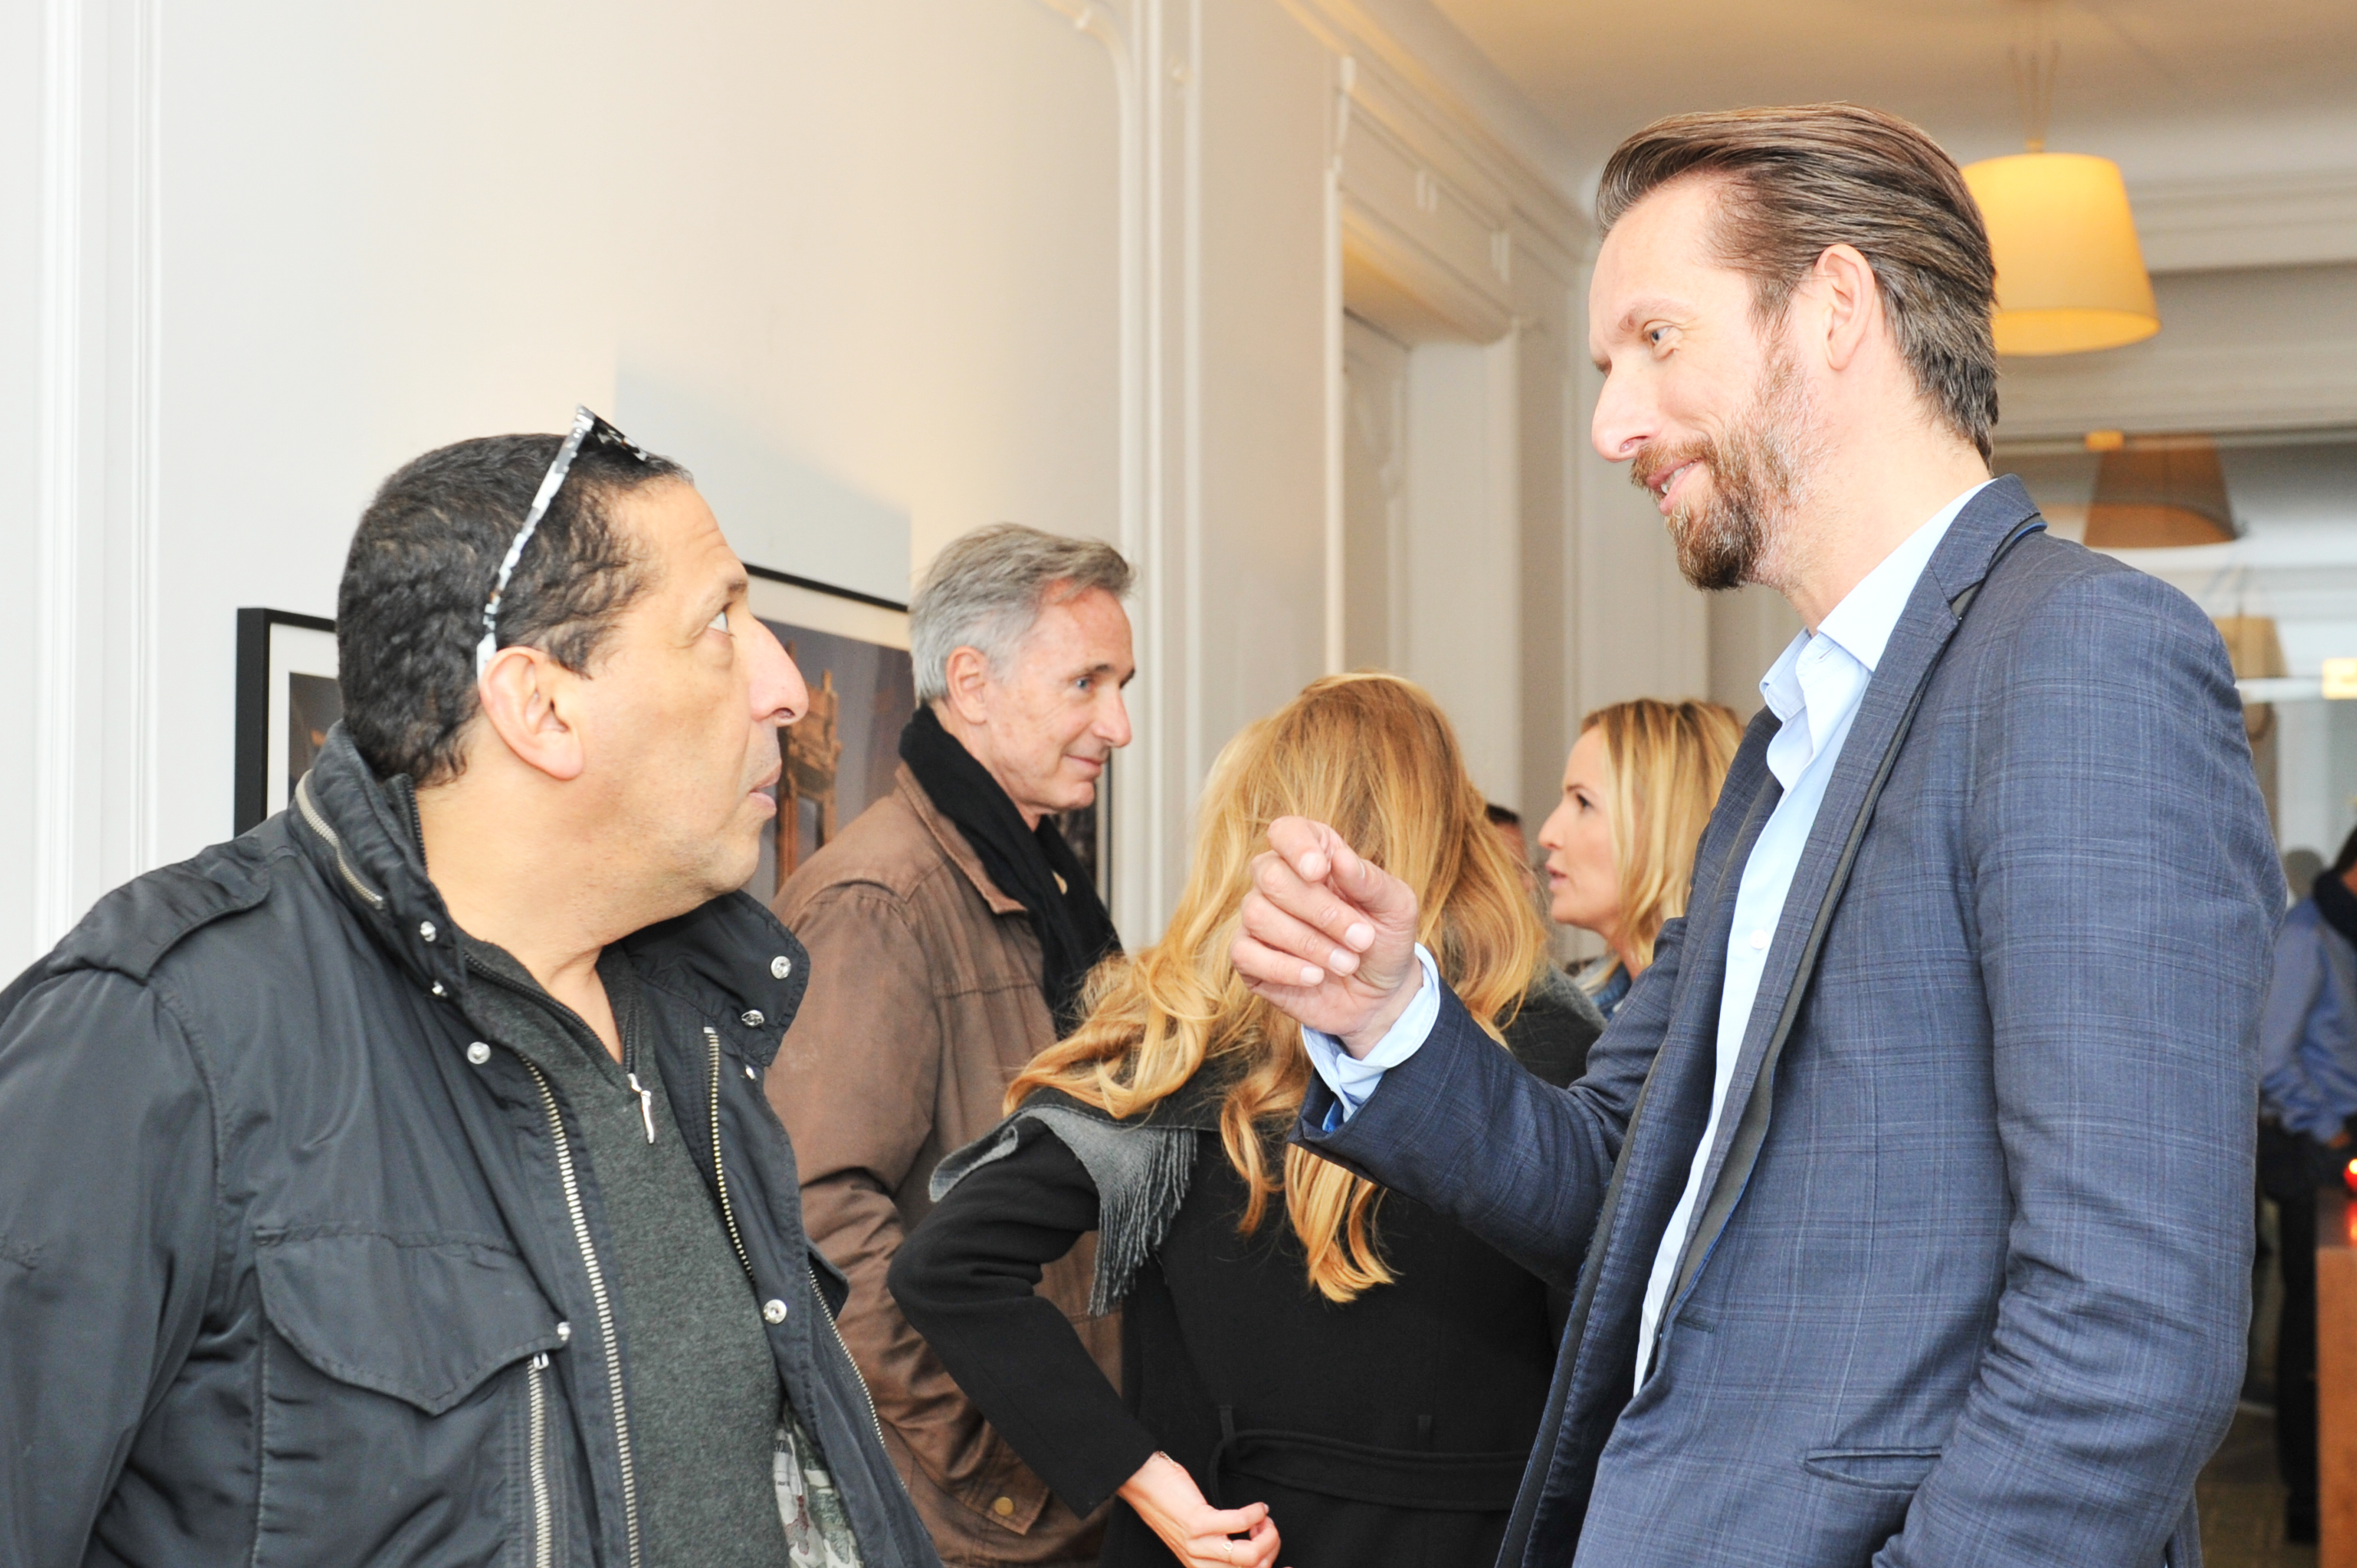 Smaïn, Thierry Lhermite & Sam Bobino